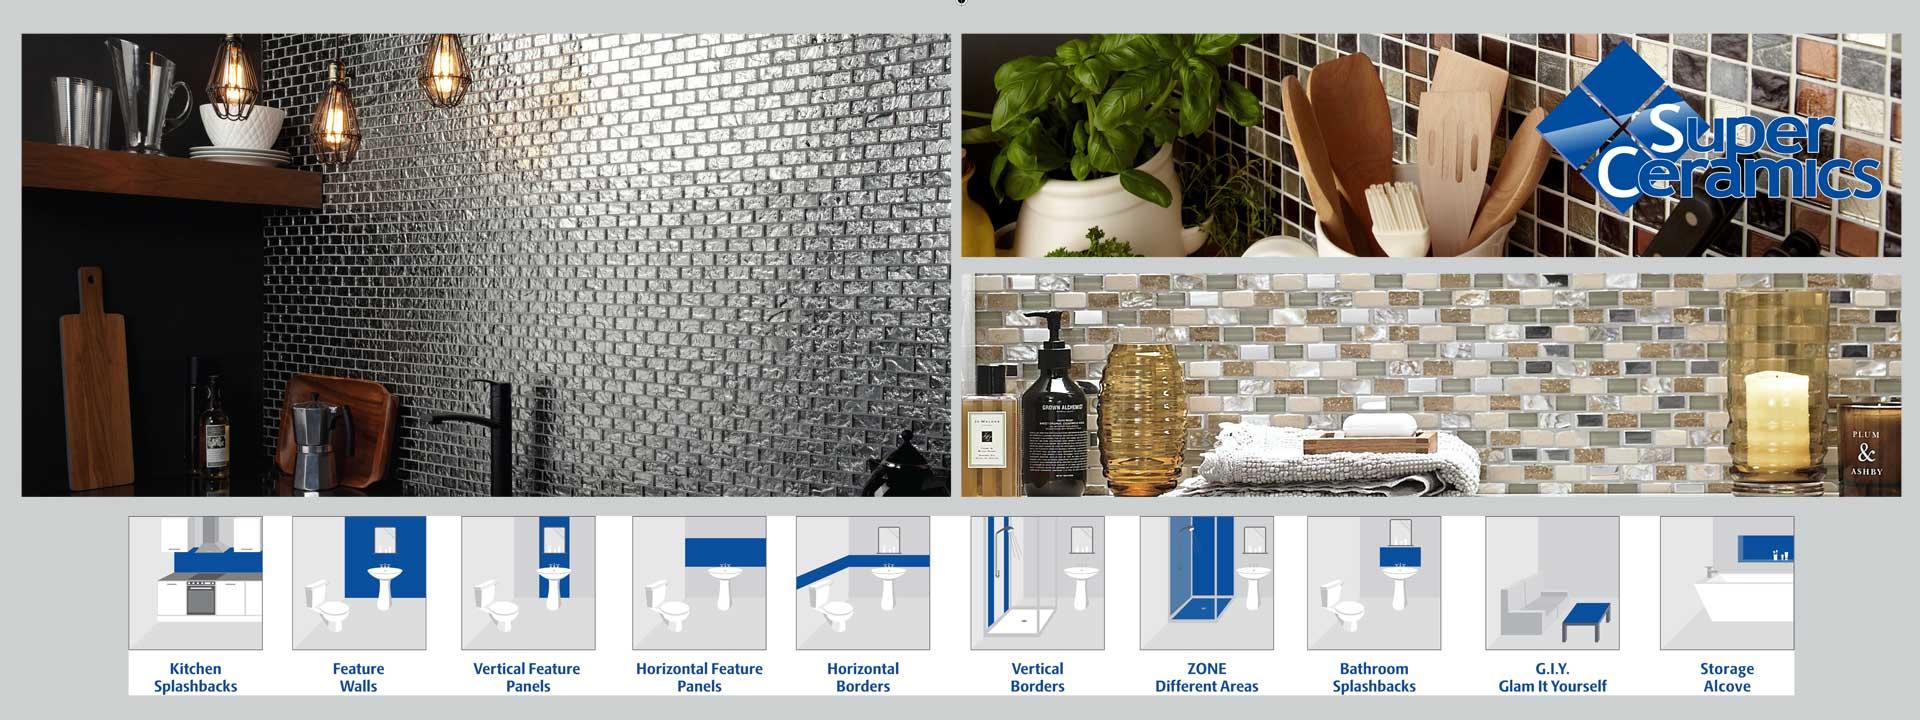 Superceramics Sales Superceramic Tile Shop - Bulk tile warehouse